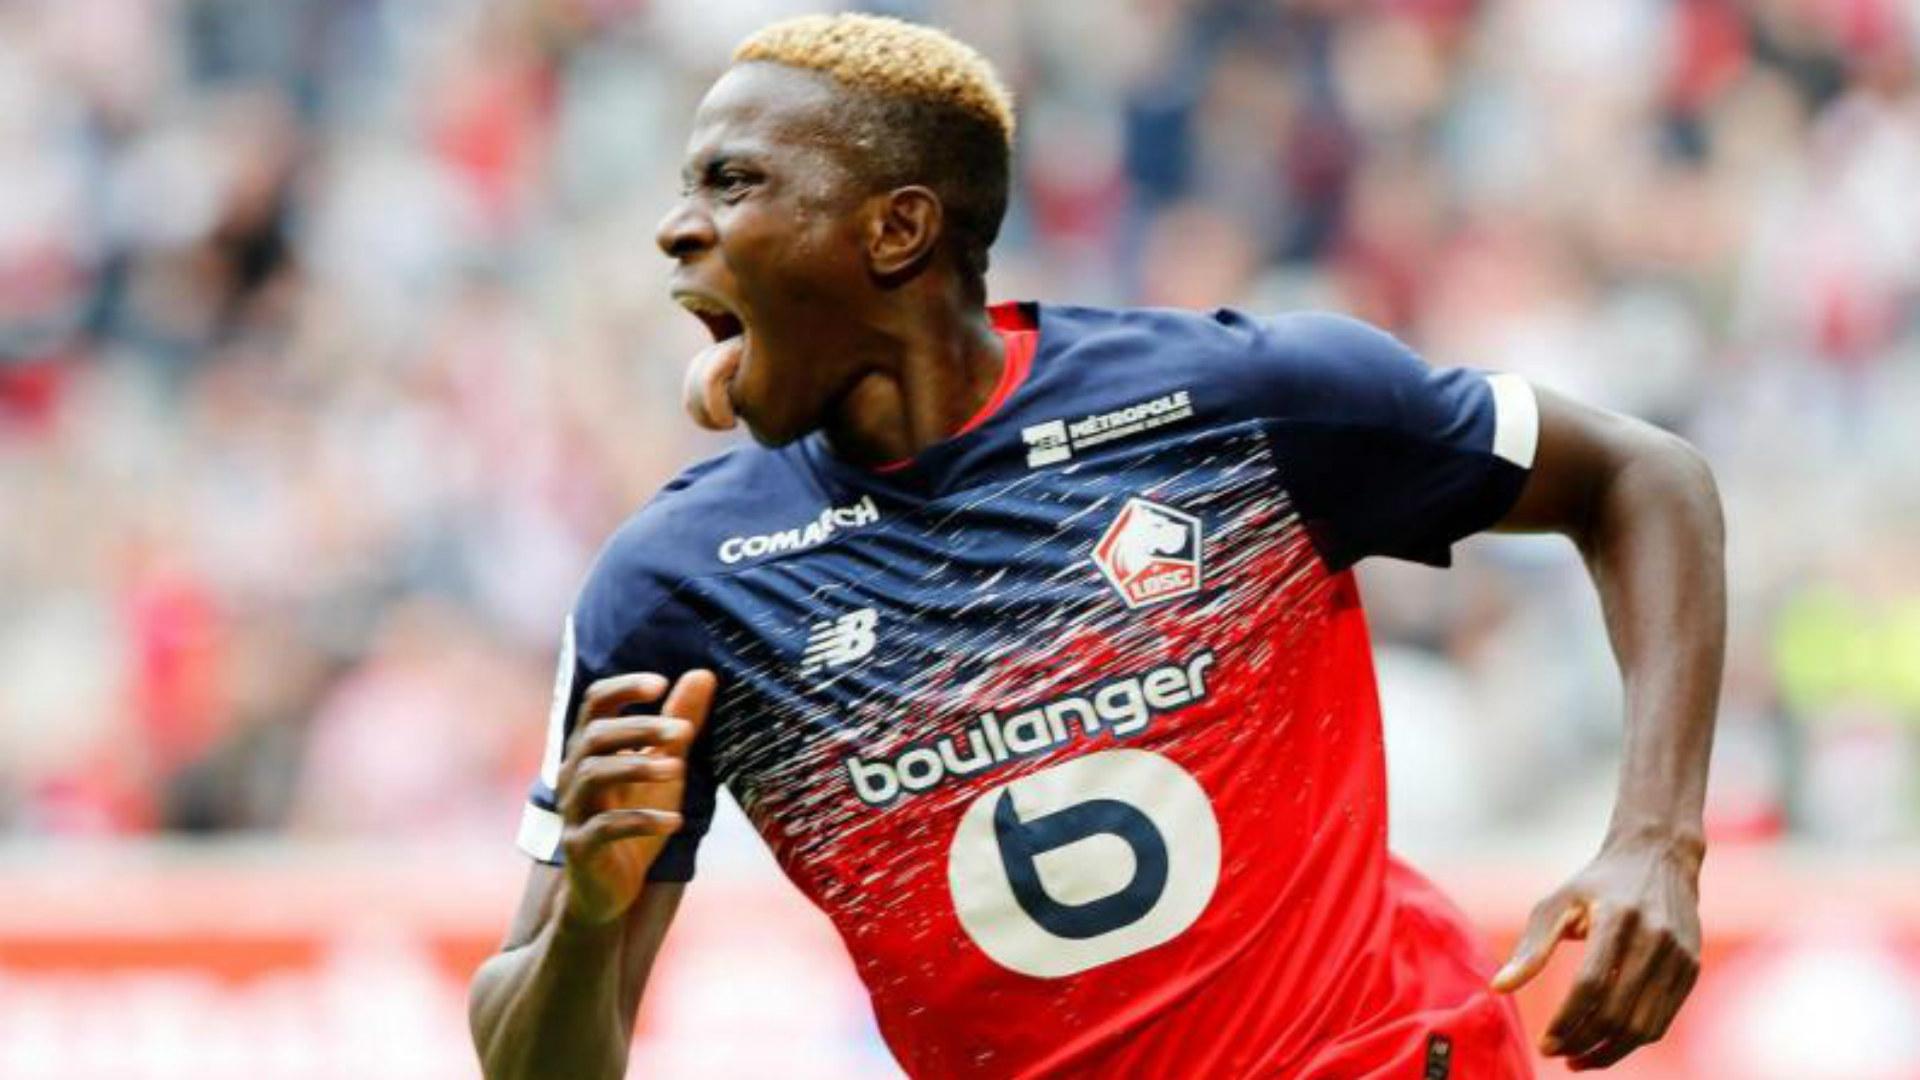 Osimhen's future is uncertain - Lille OSC coach Galtier | Goal.com